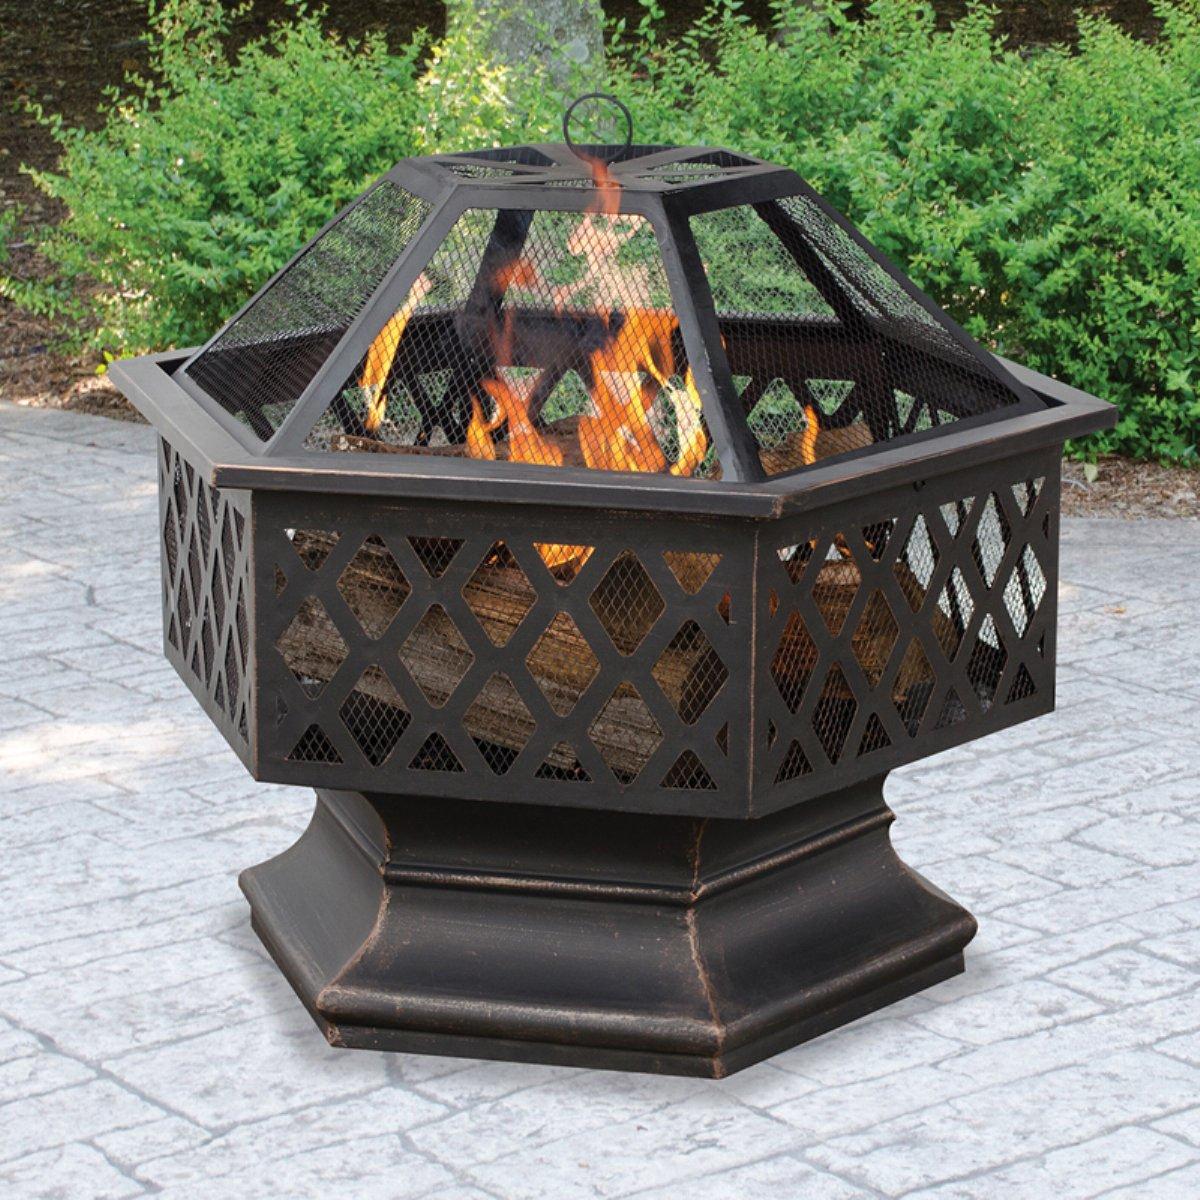 Belleze Hex Shaped Firepit Outdoor Home Garden Backyard Fireplace Fire Pit w Lid